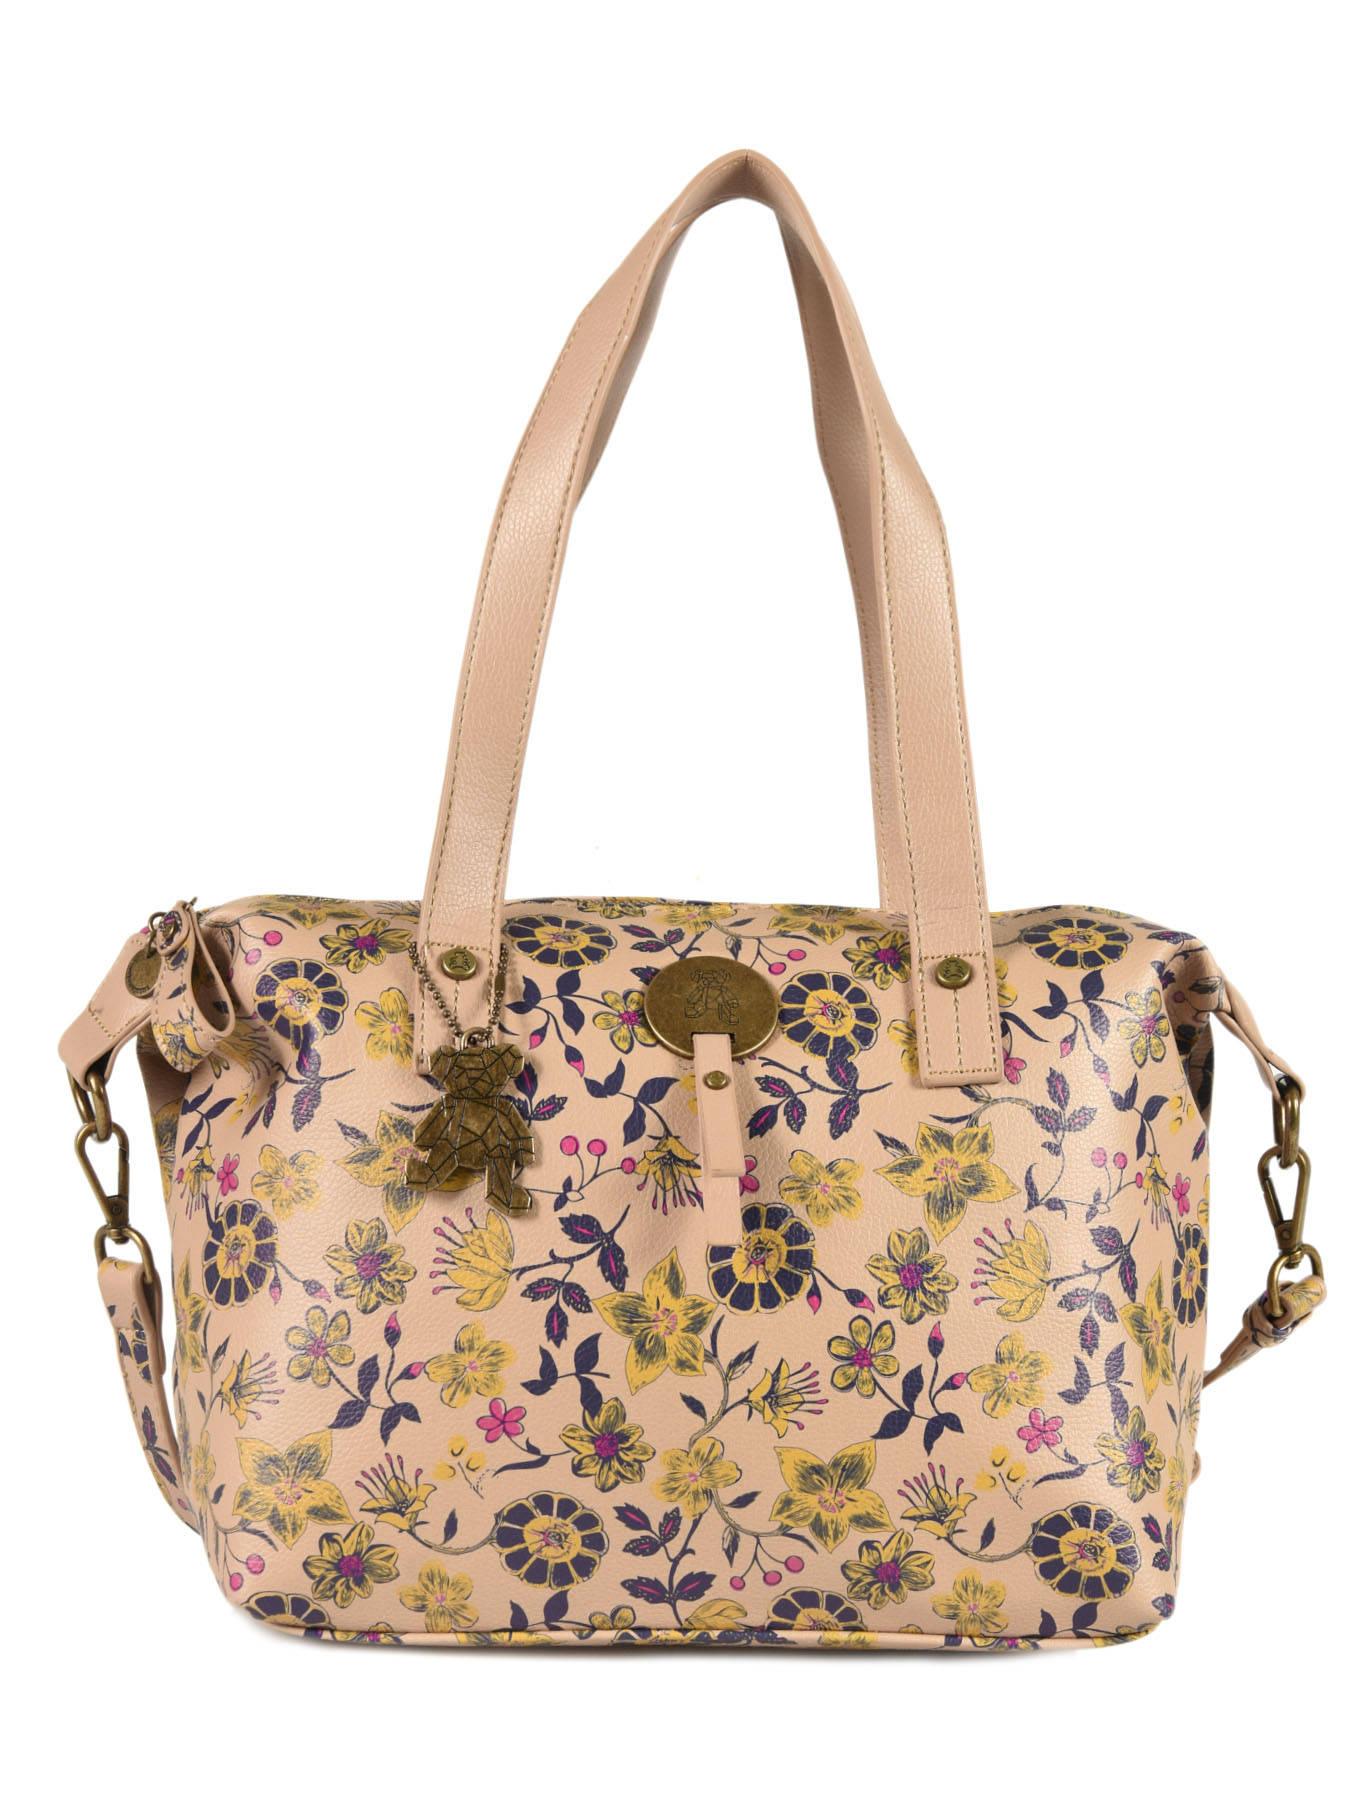 Shopping Lulu Sac Floral Sac Floral Castagnette Shopping UVLqMjSpzG